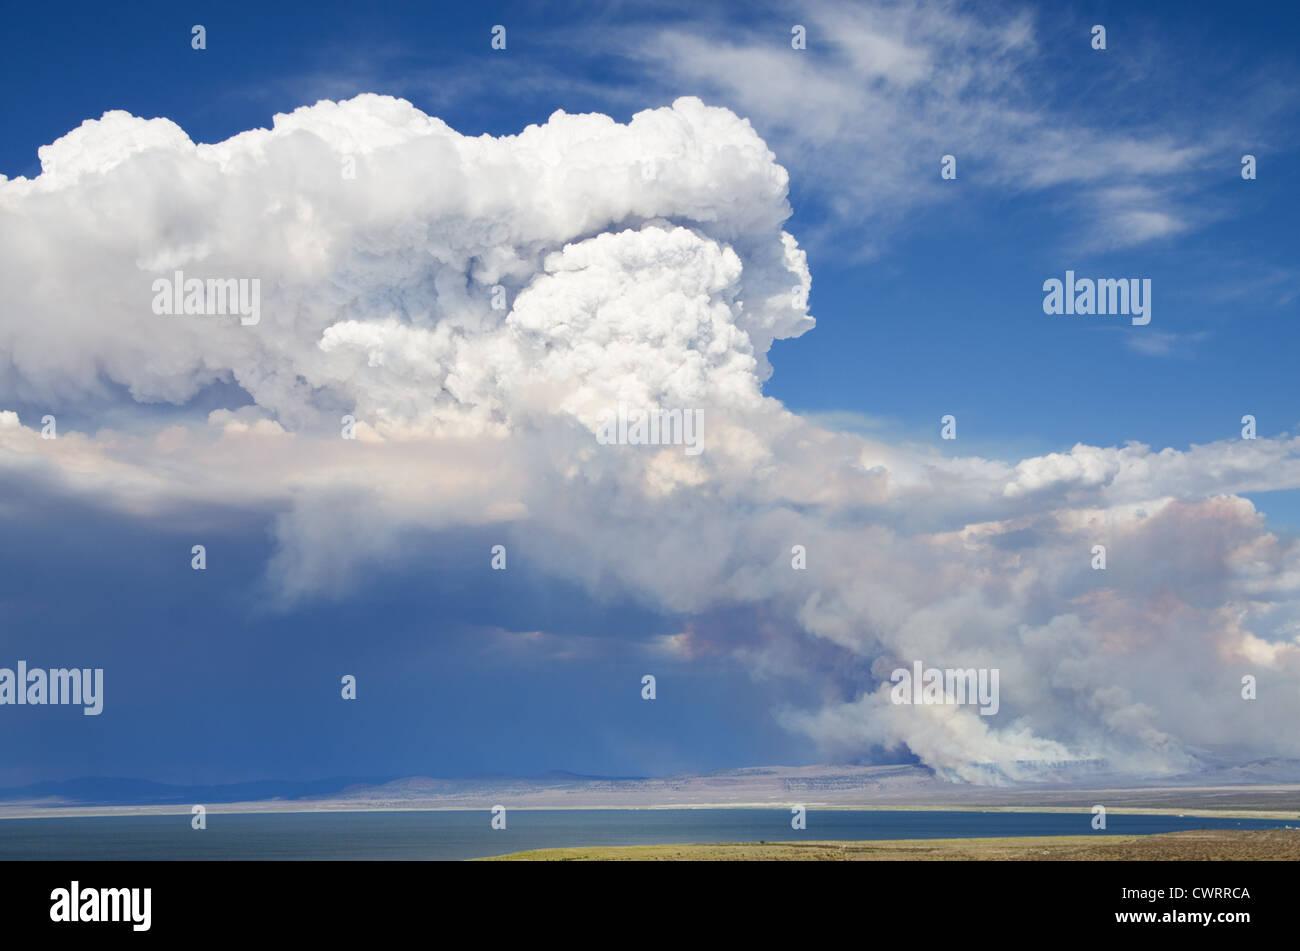 smoke and a cloud rises above a wildfire near Mono Lake - Stock Image